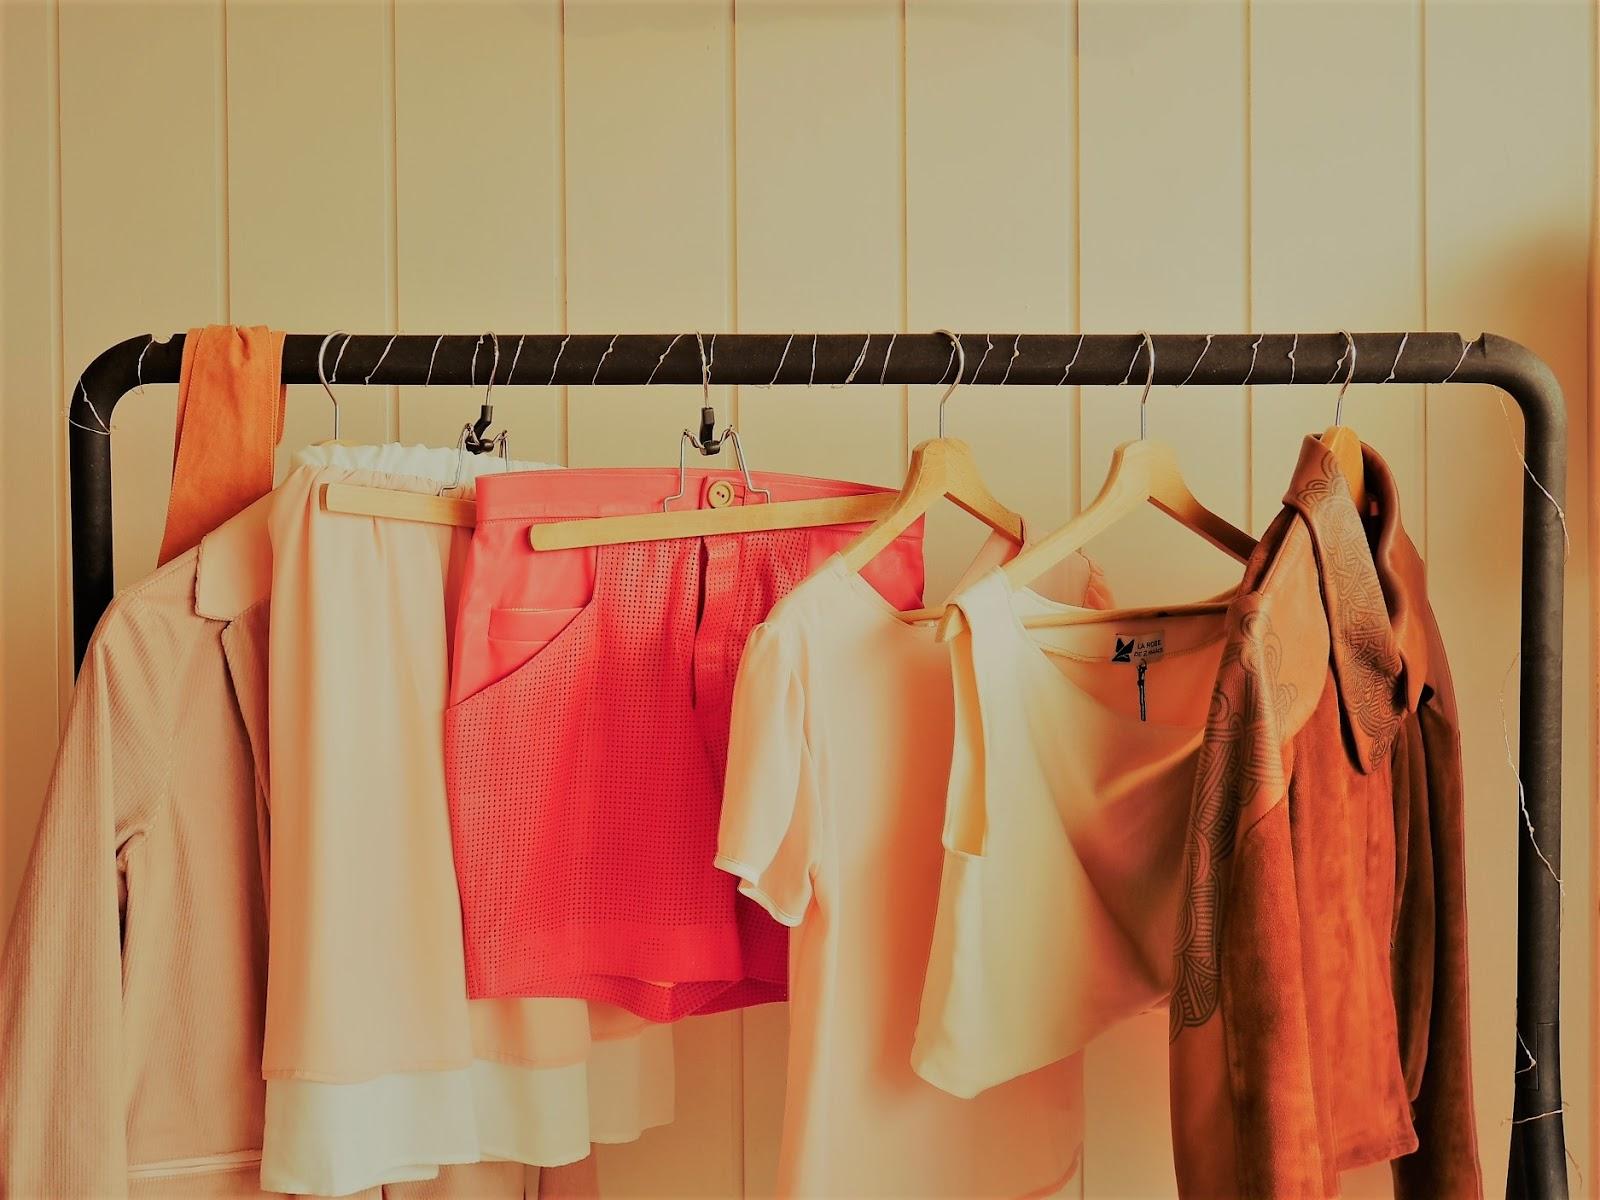 pret-a-porter-creatrice-mode-la-robe-de-2-mains-siobhan-langry